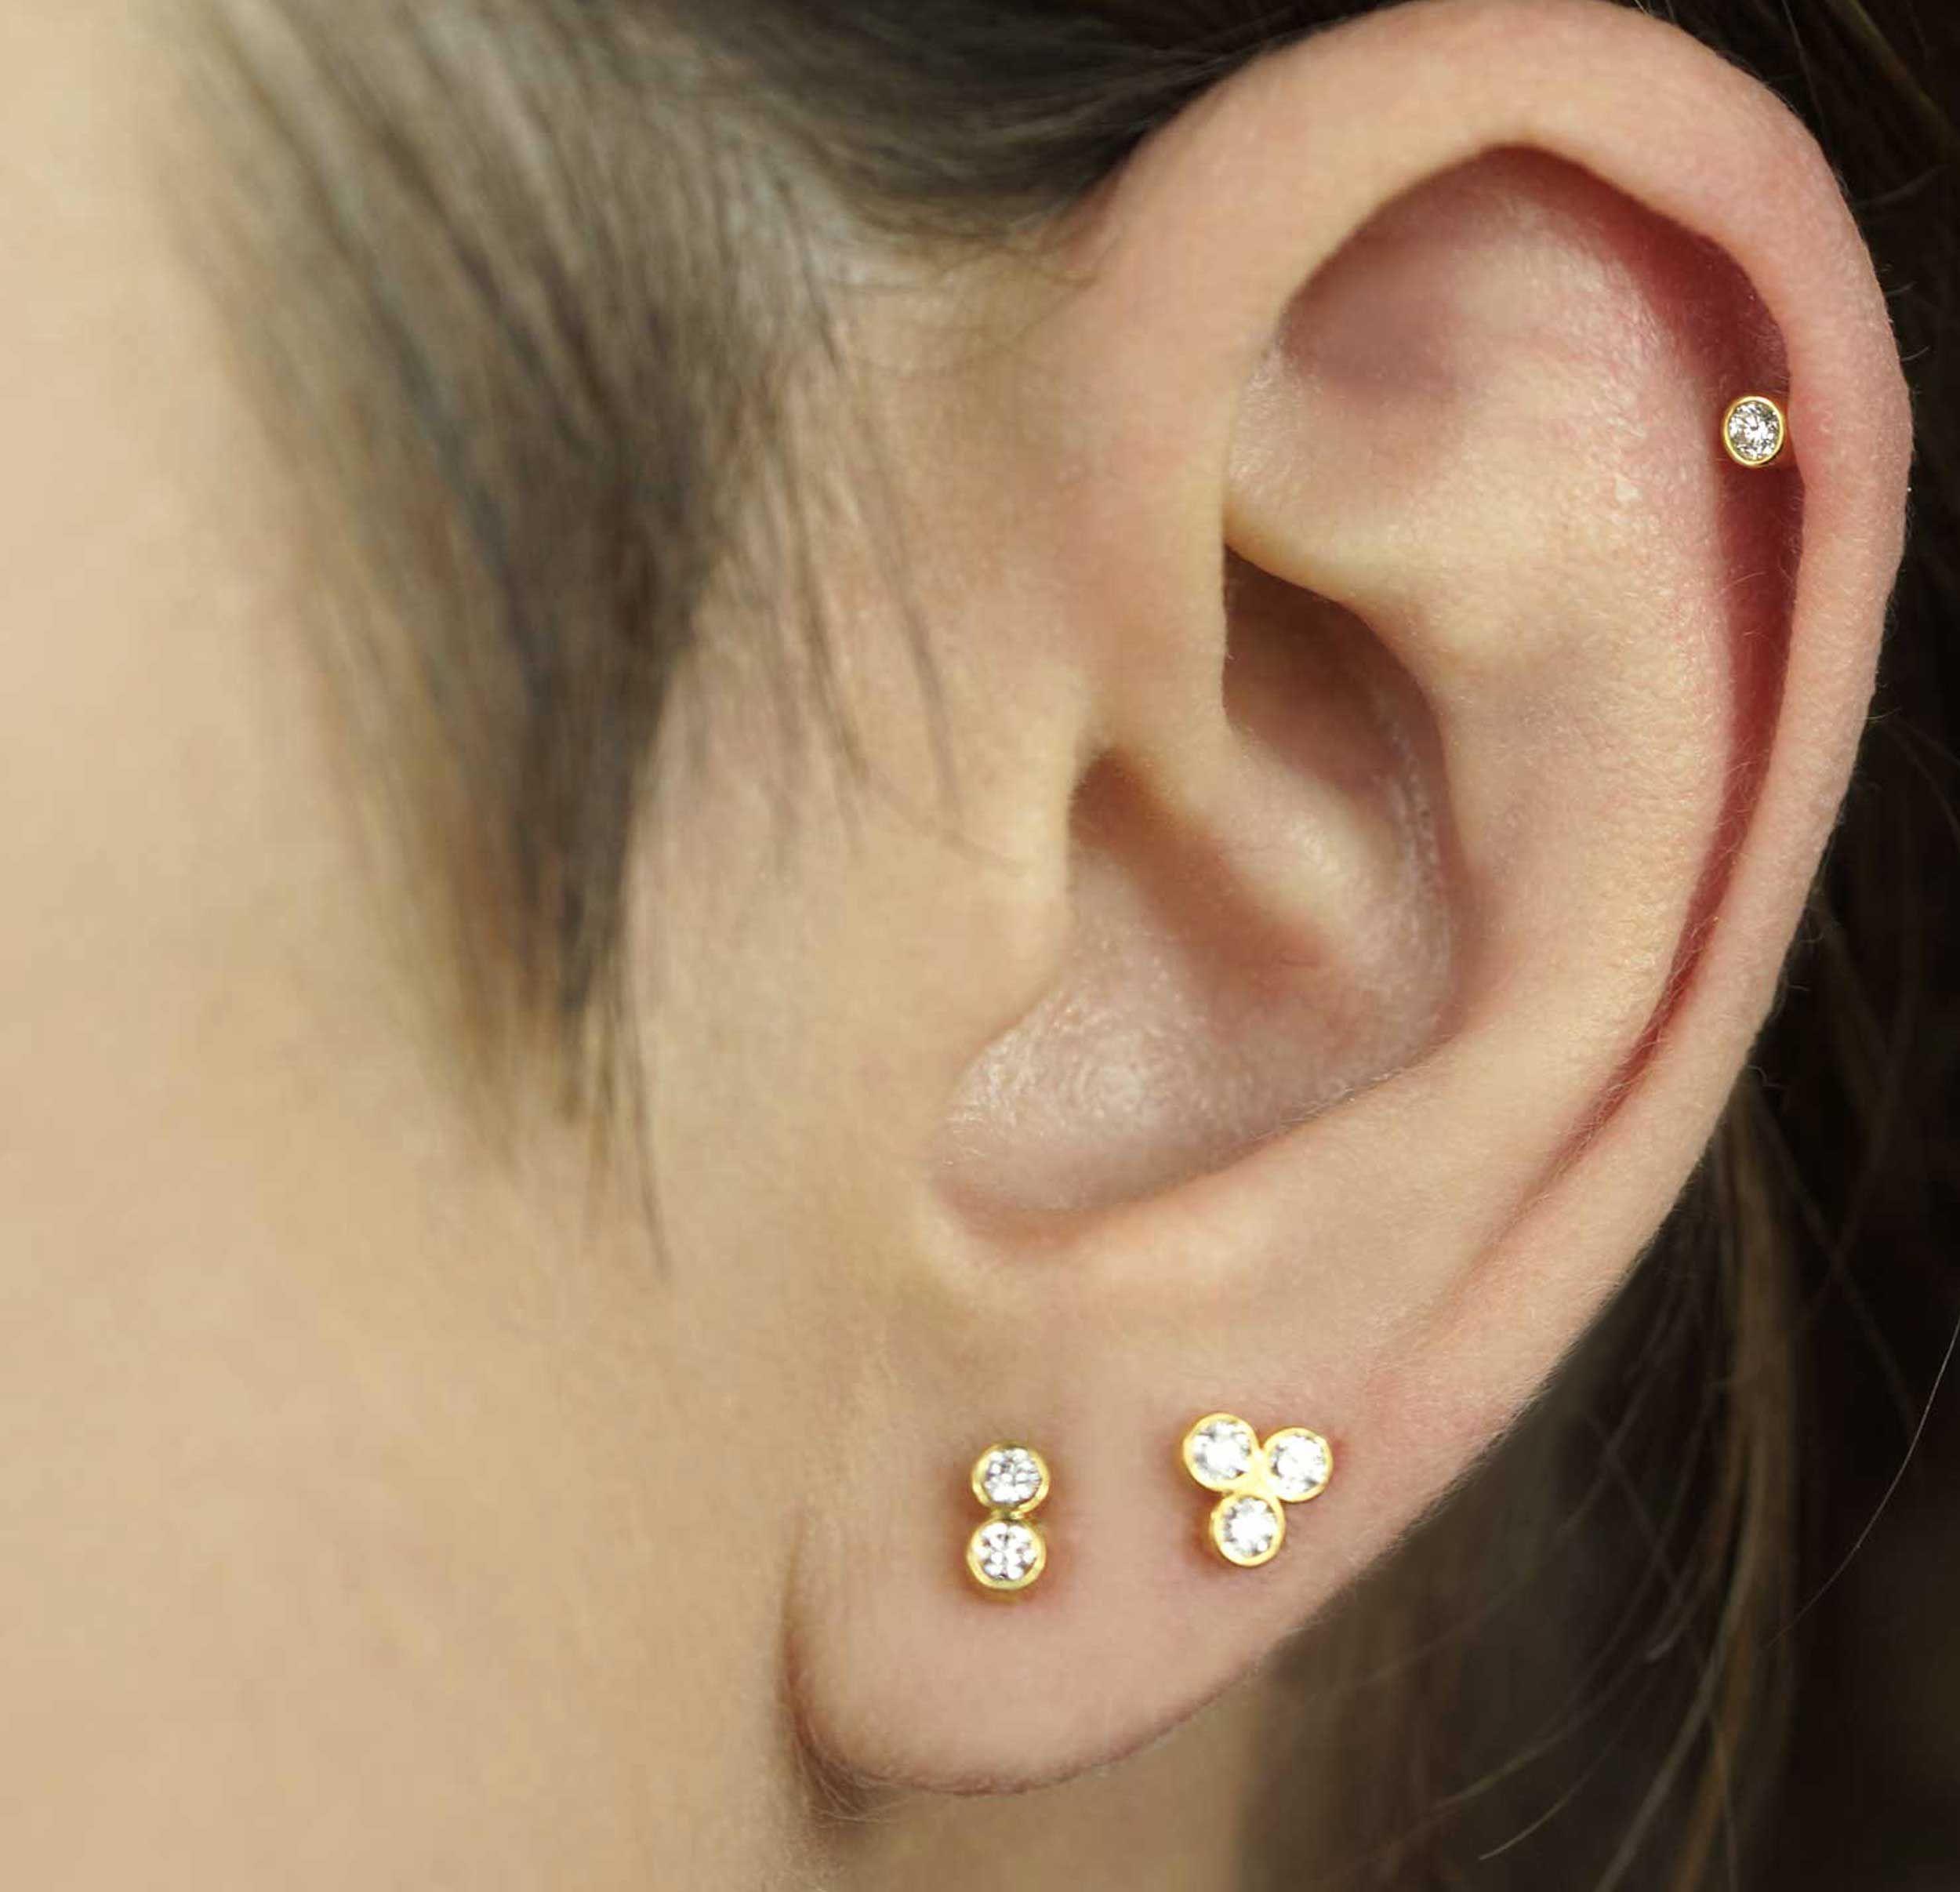 d972c6f53 Medium Single Diamond 18K Yellow Gold Cartilage Piercing Stud | LENA COHEN  Our jewelry takes piercings